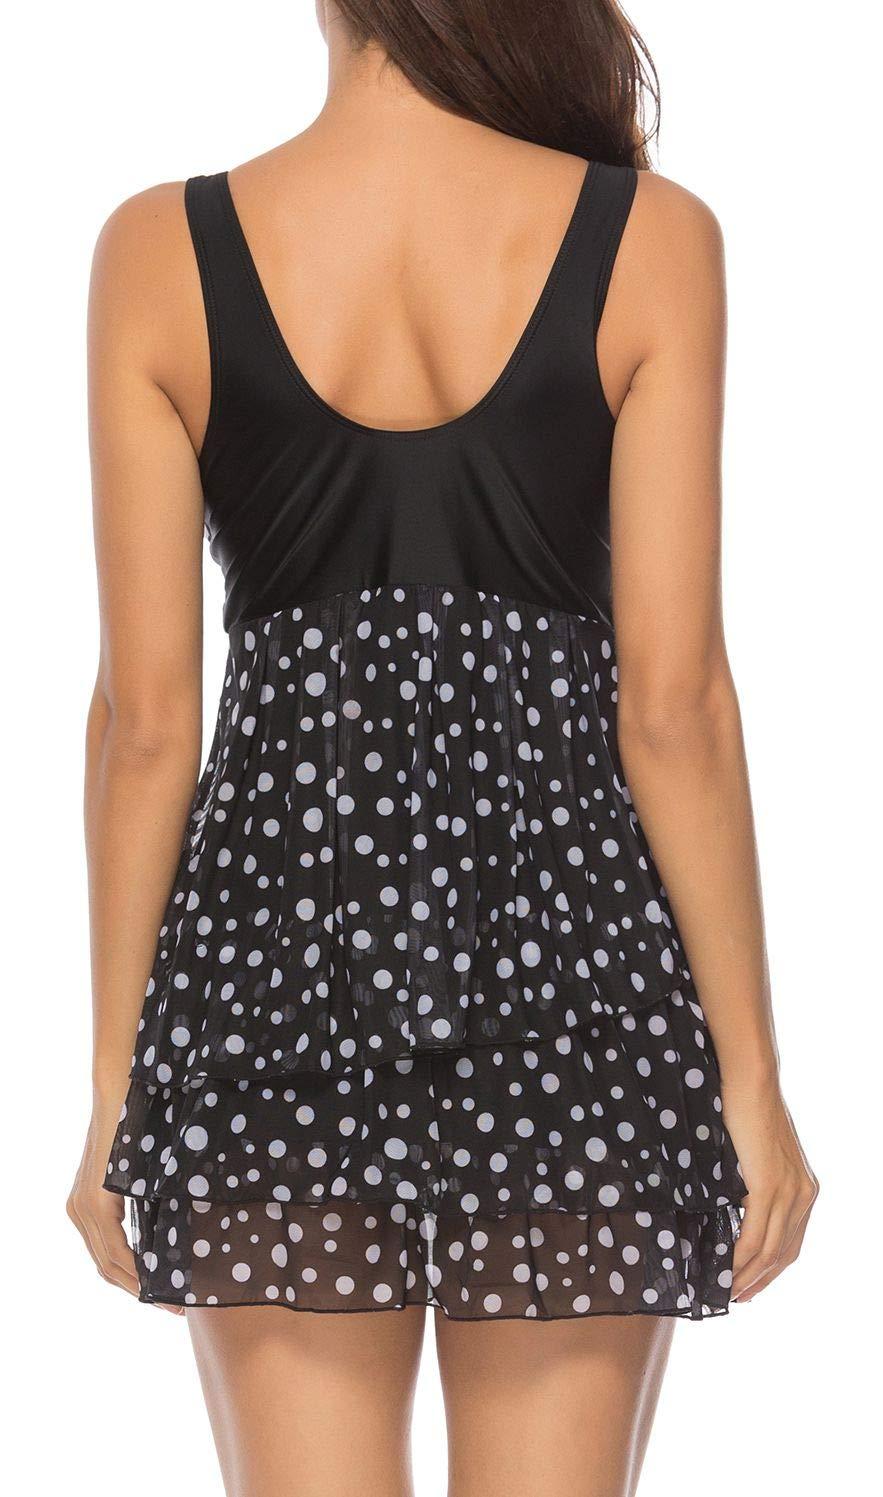 Yong Dong Women Tummy Control Swimdress Swimwear Print Skirted Two Piece Swimsuit Bathing Suit Dress Polka Dot M